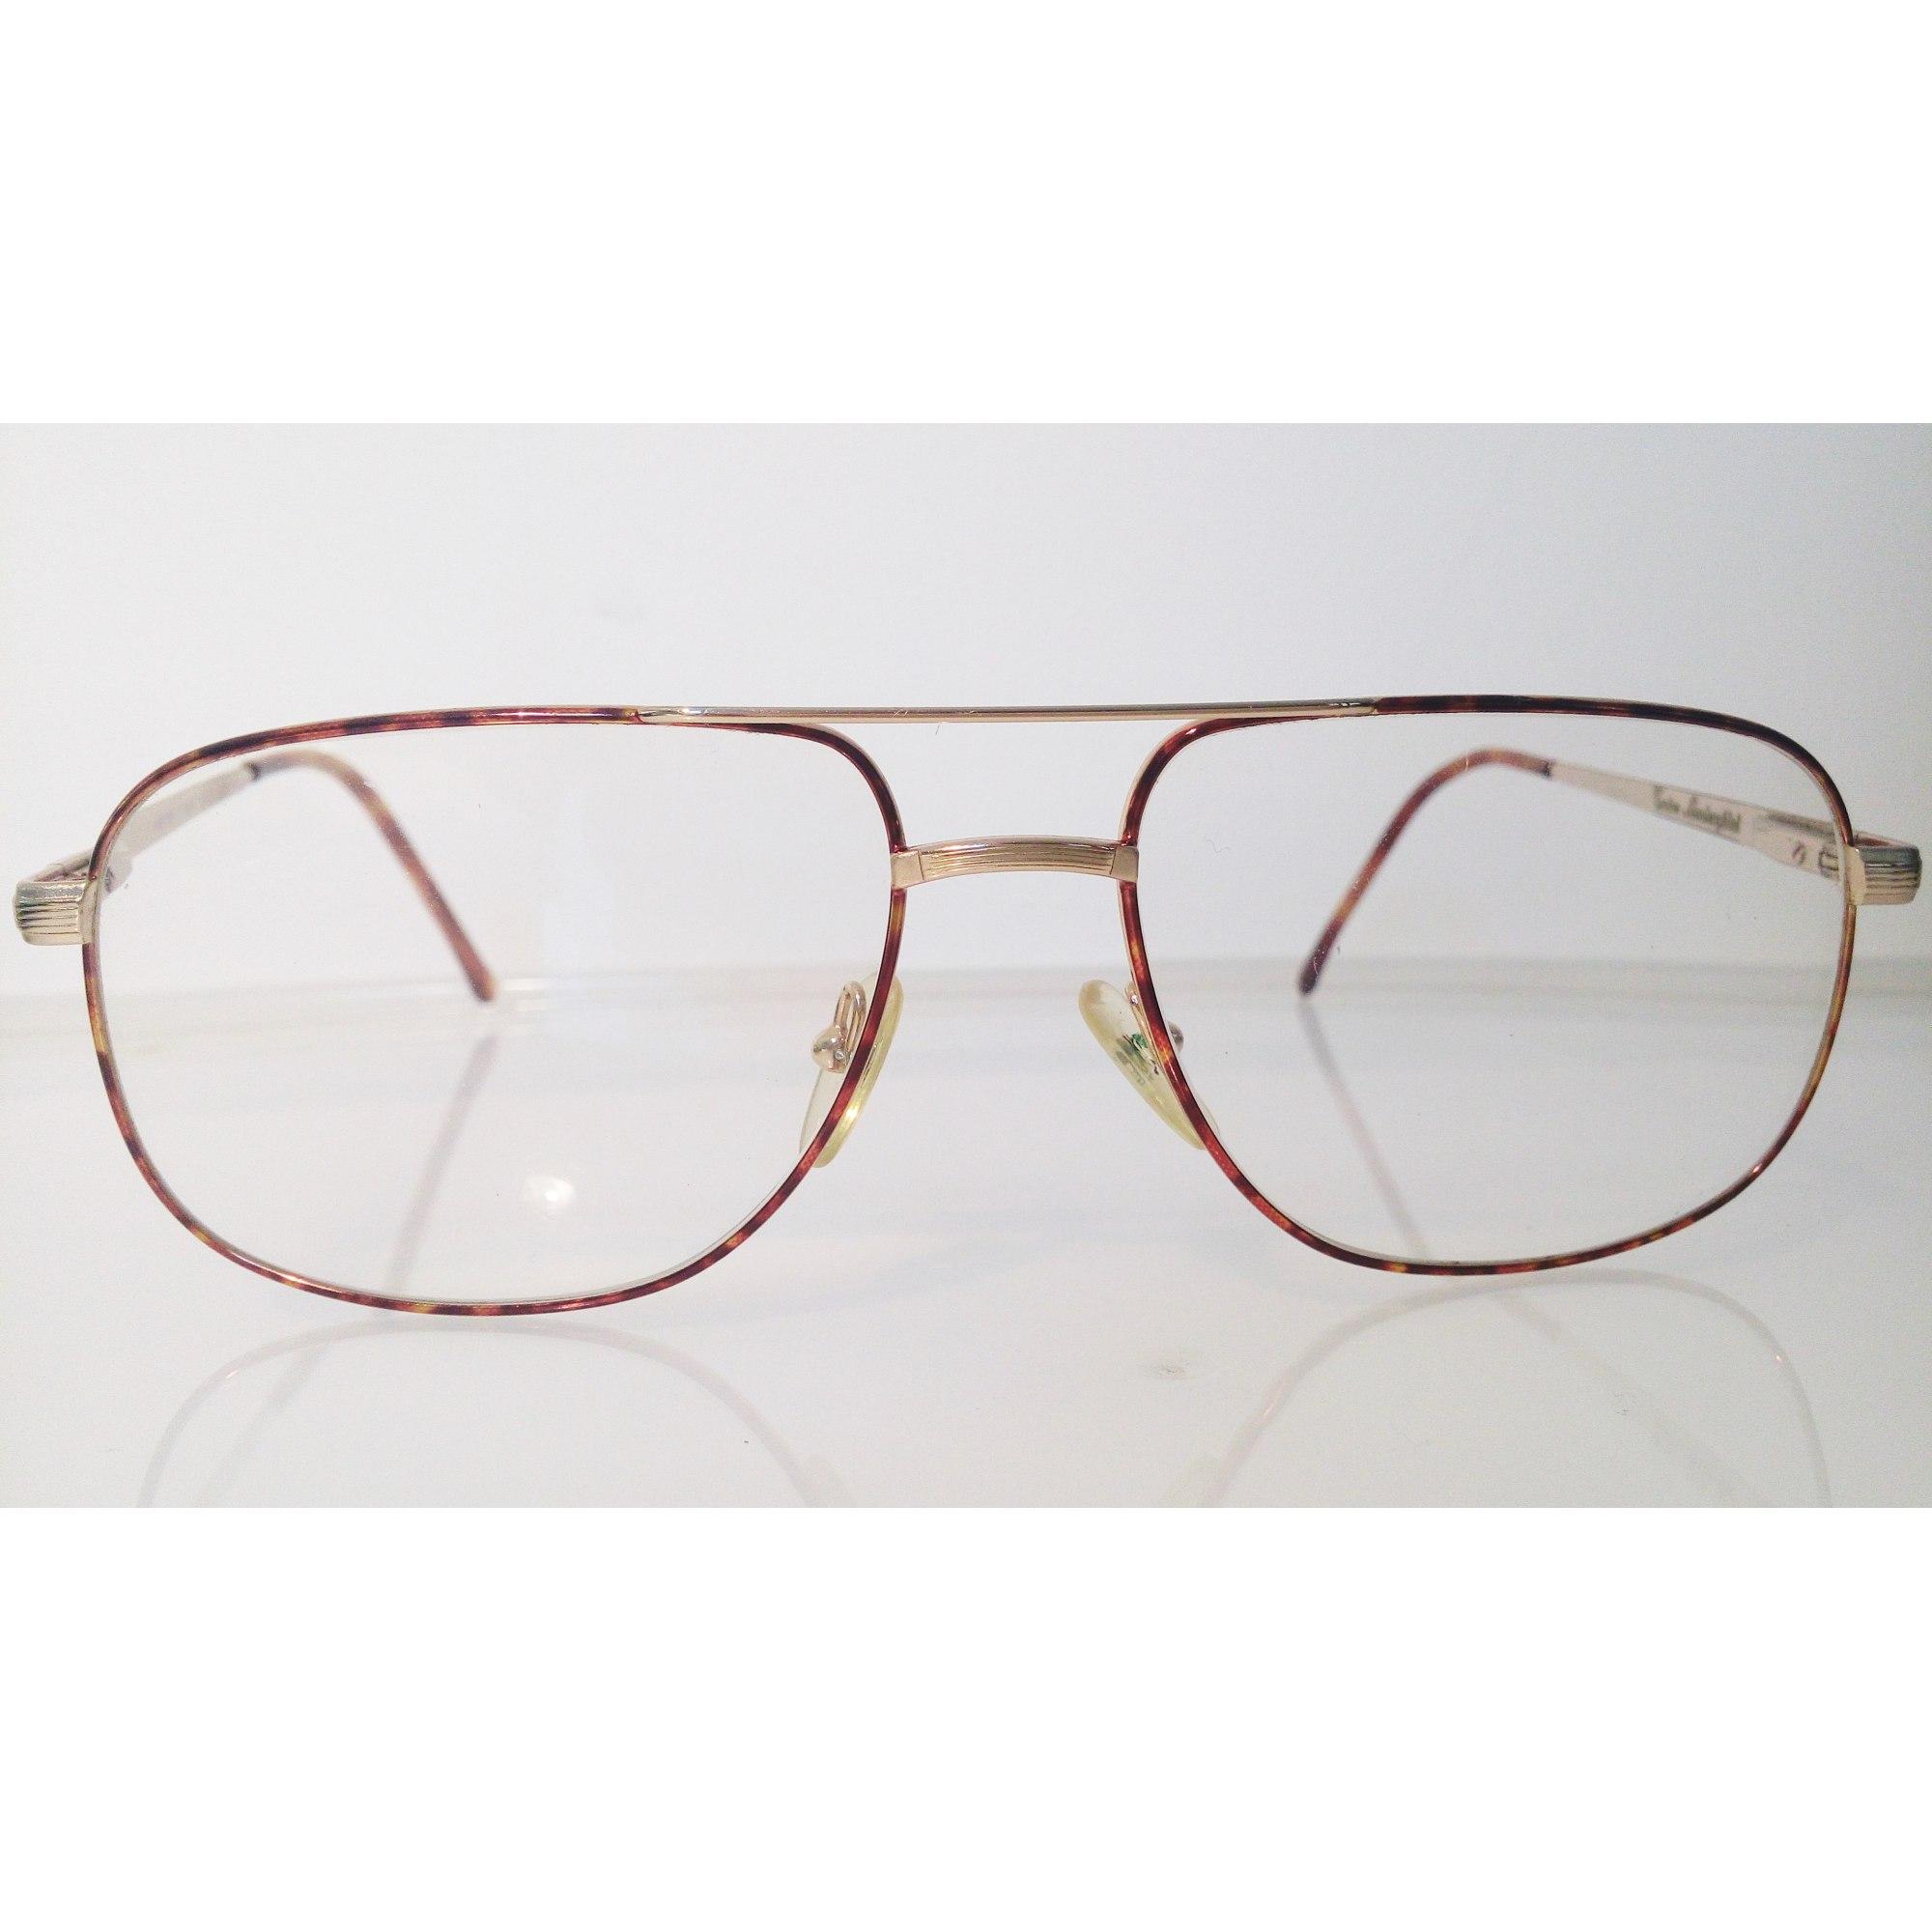 Eyeglass Frames TONINO LAMBORGHINI Golden, bronze, copper